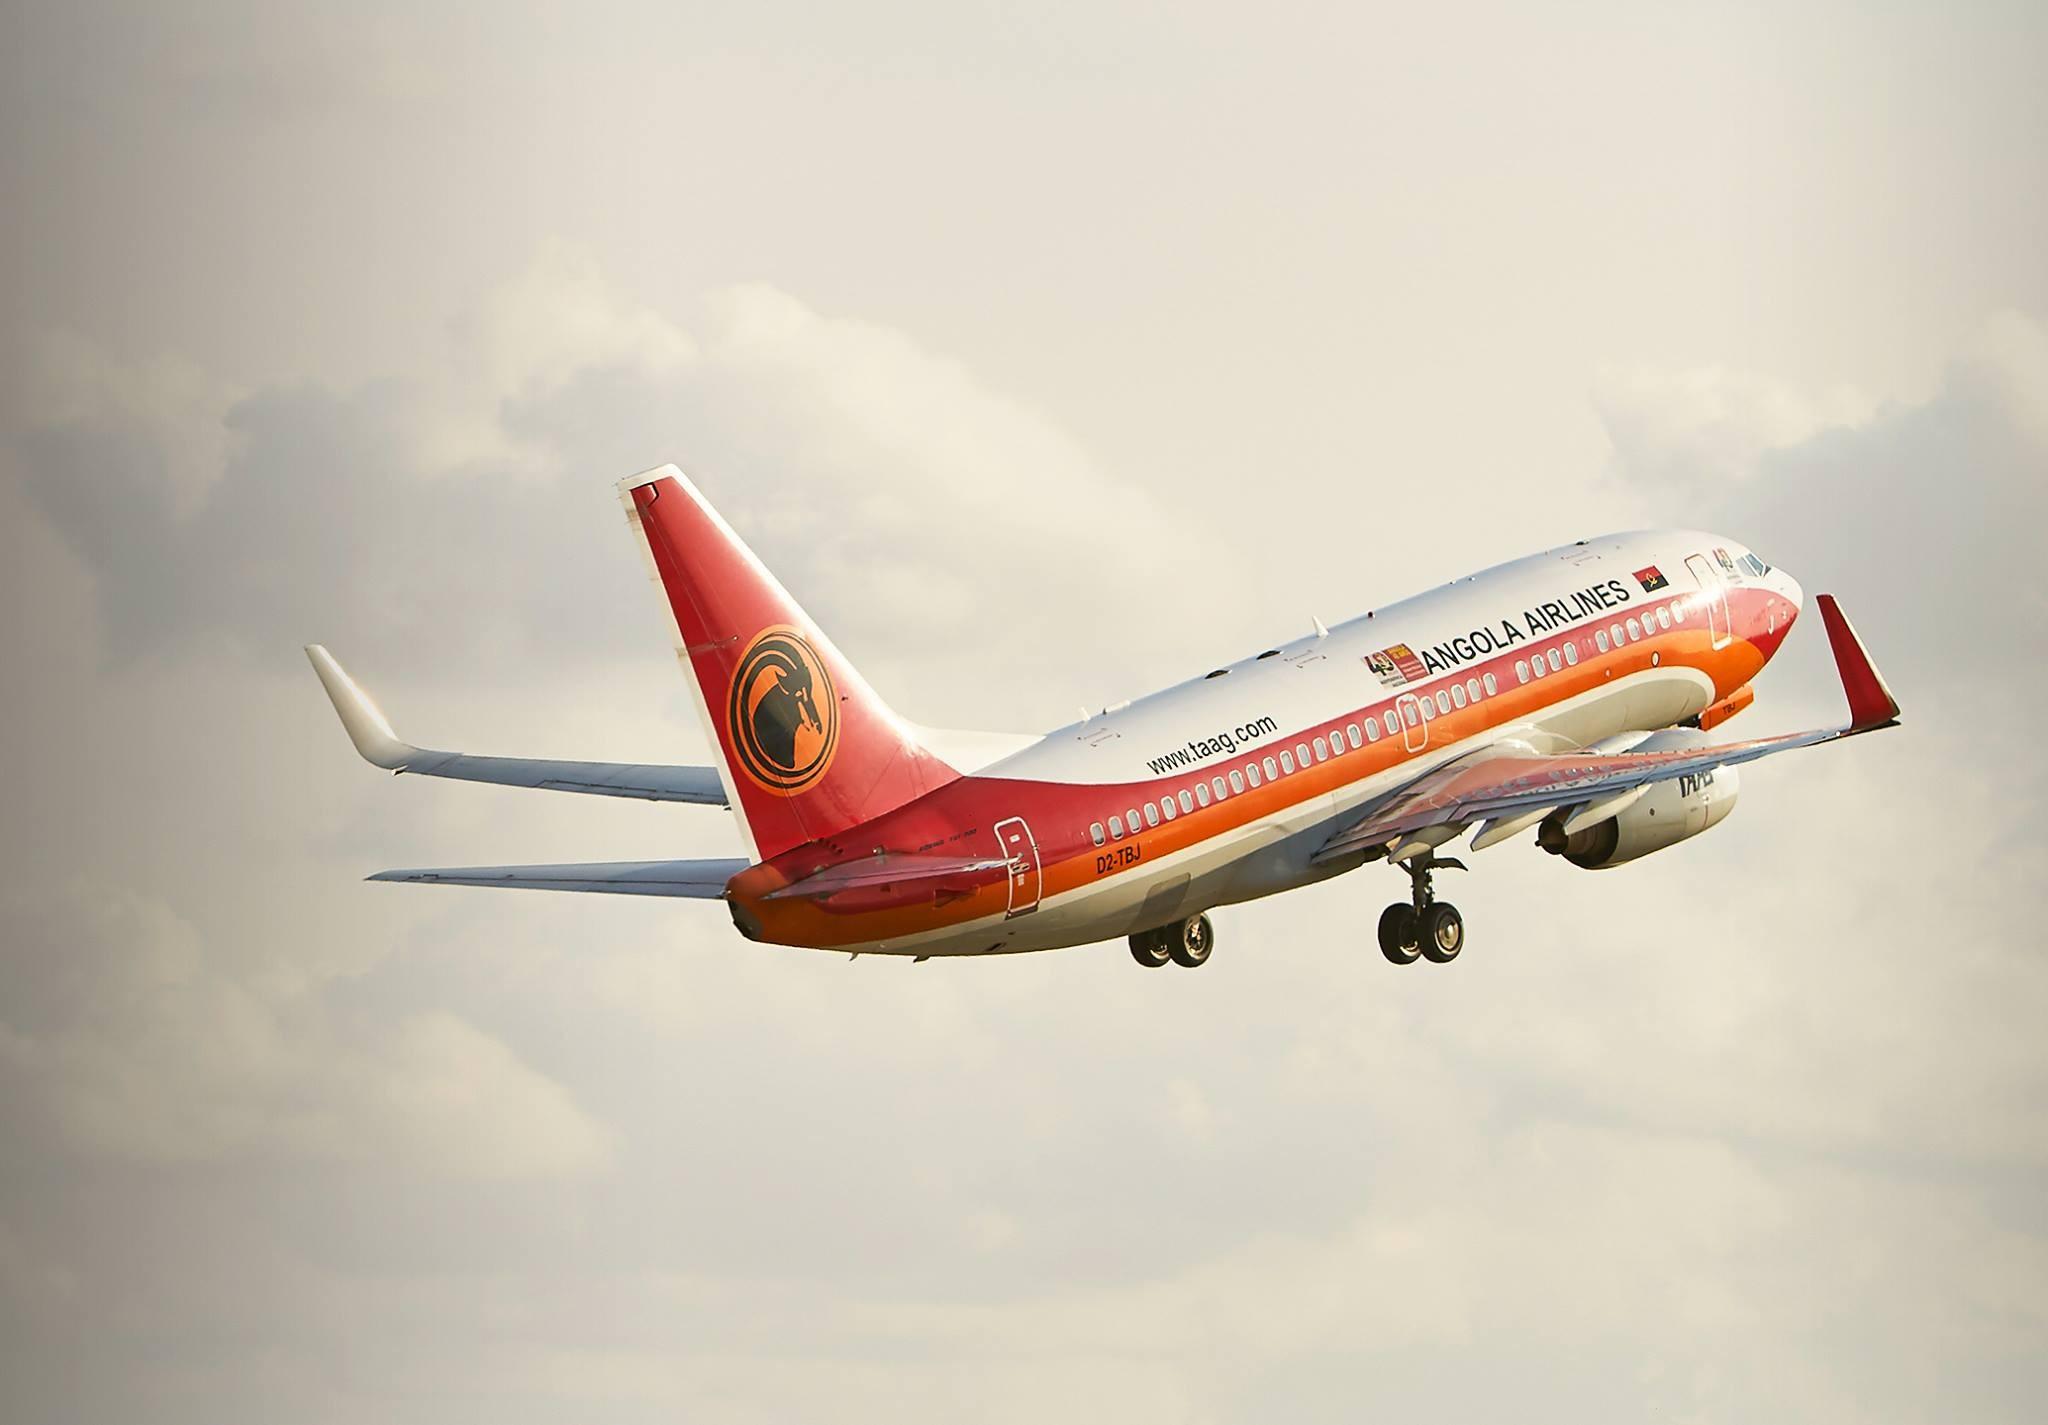 TAAG se despede do Rio de Janeiro após 34 anos de voos para Angola